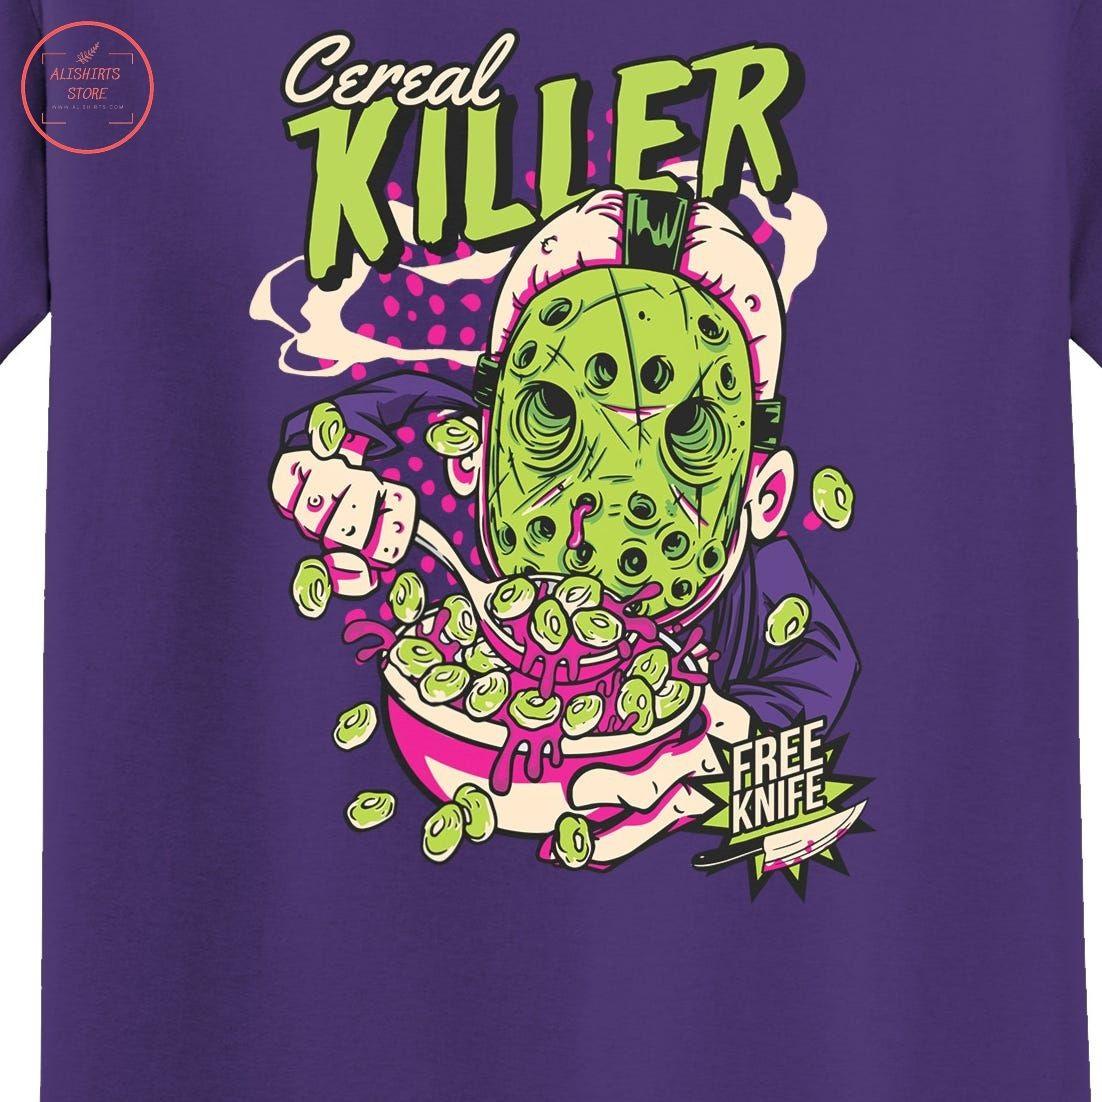 Cereal Killer Funny Shirt